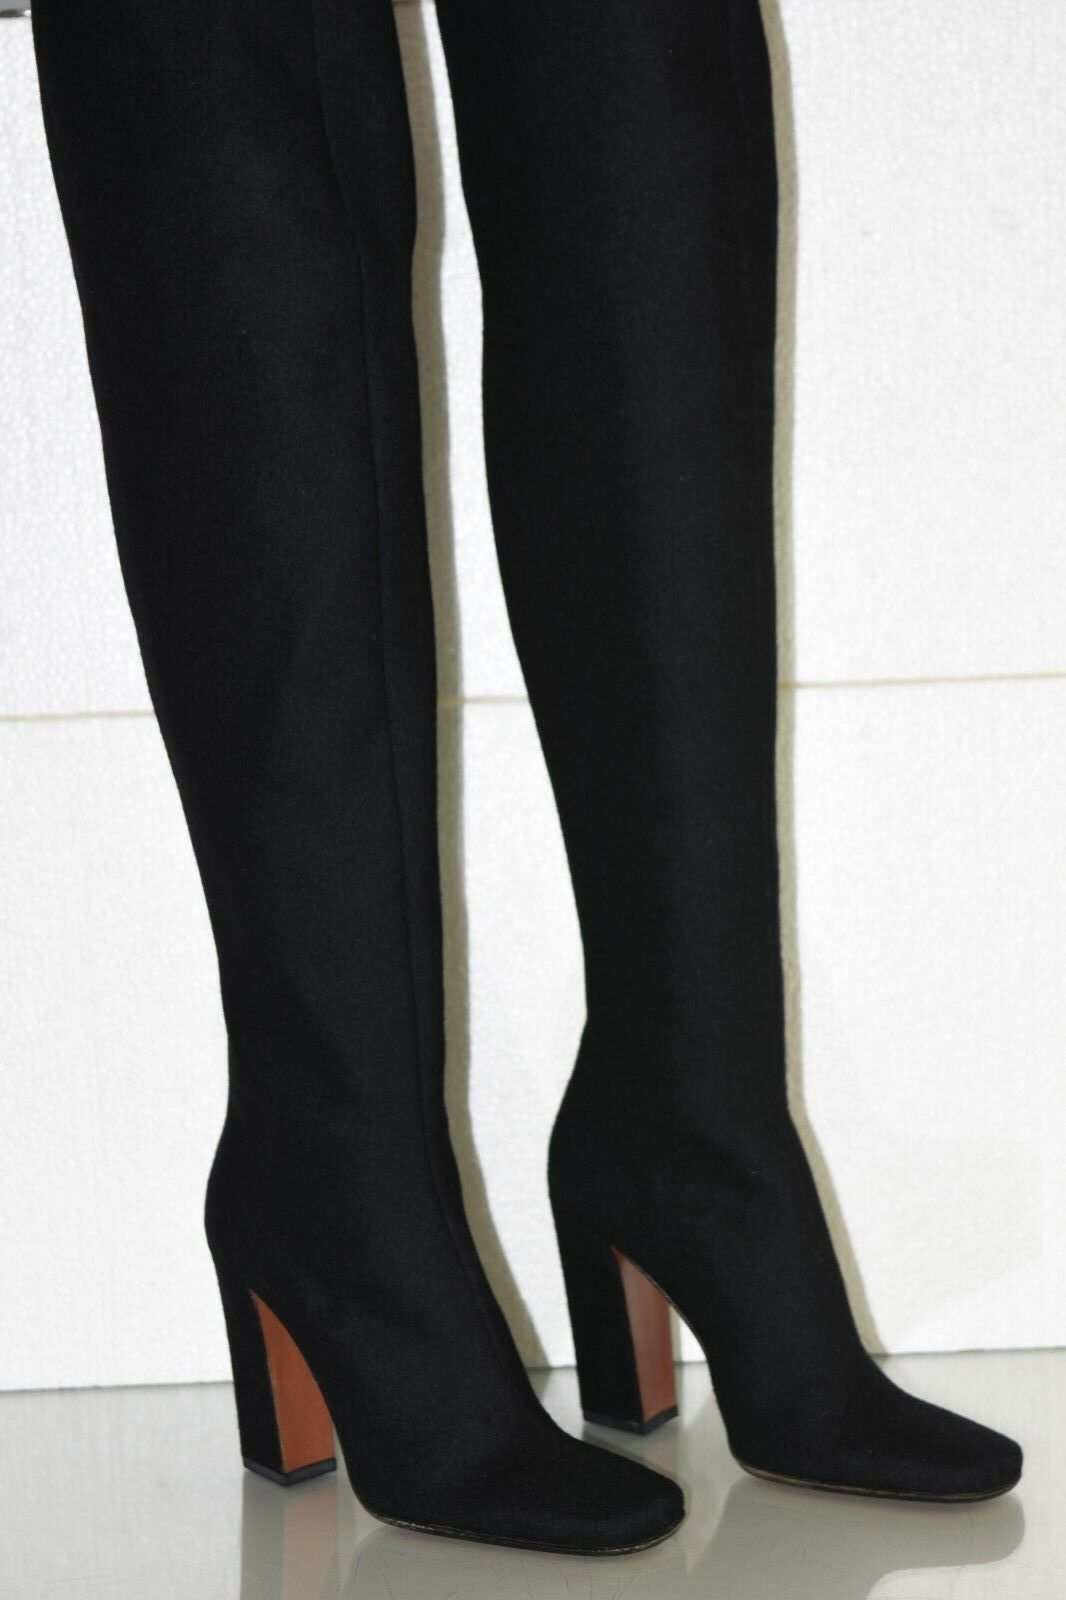 Nuevo Alaia sobre Rodilla Otk botas botas Otk Altas Negro Cachemira Zapatos de Cuero 36.5 369631